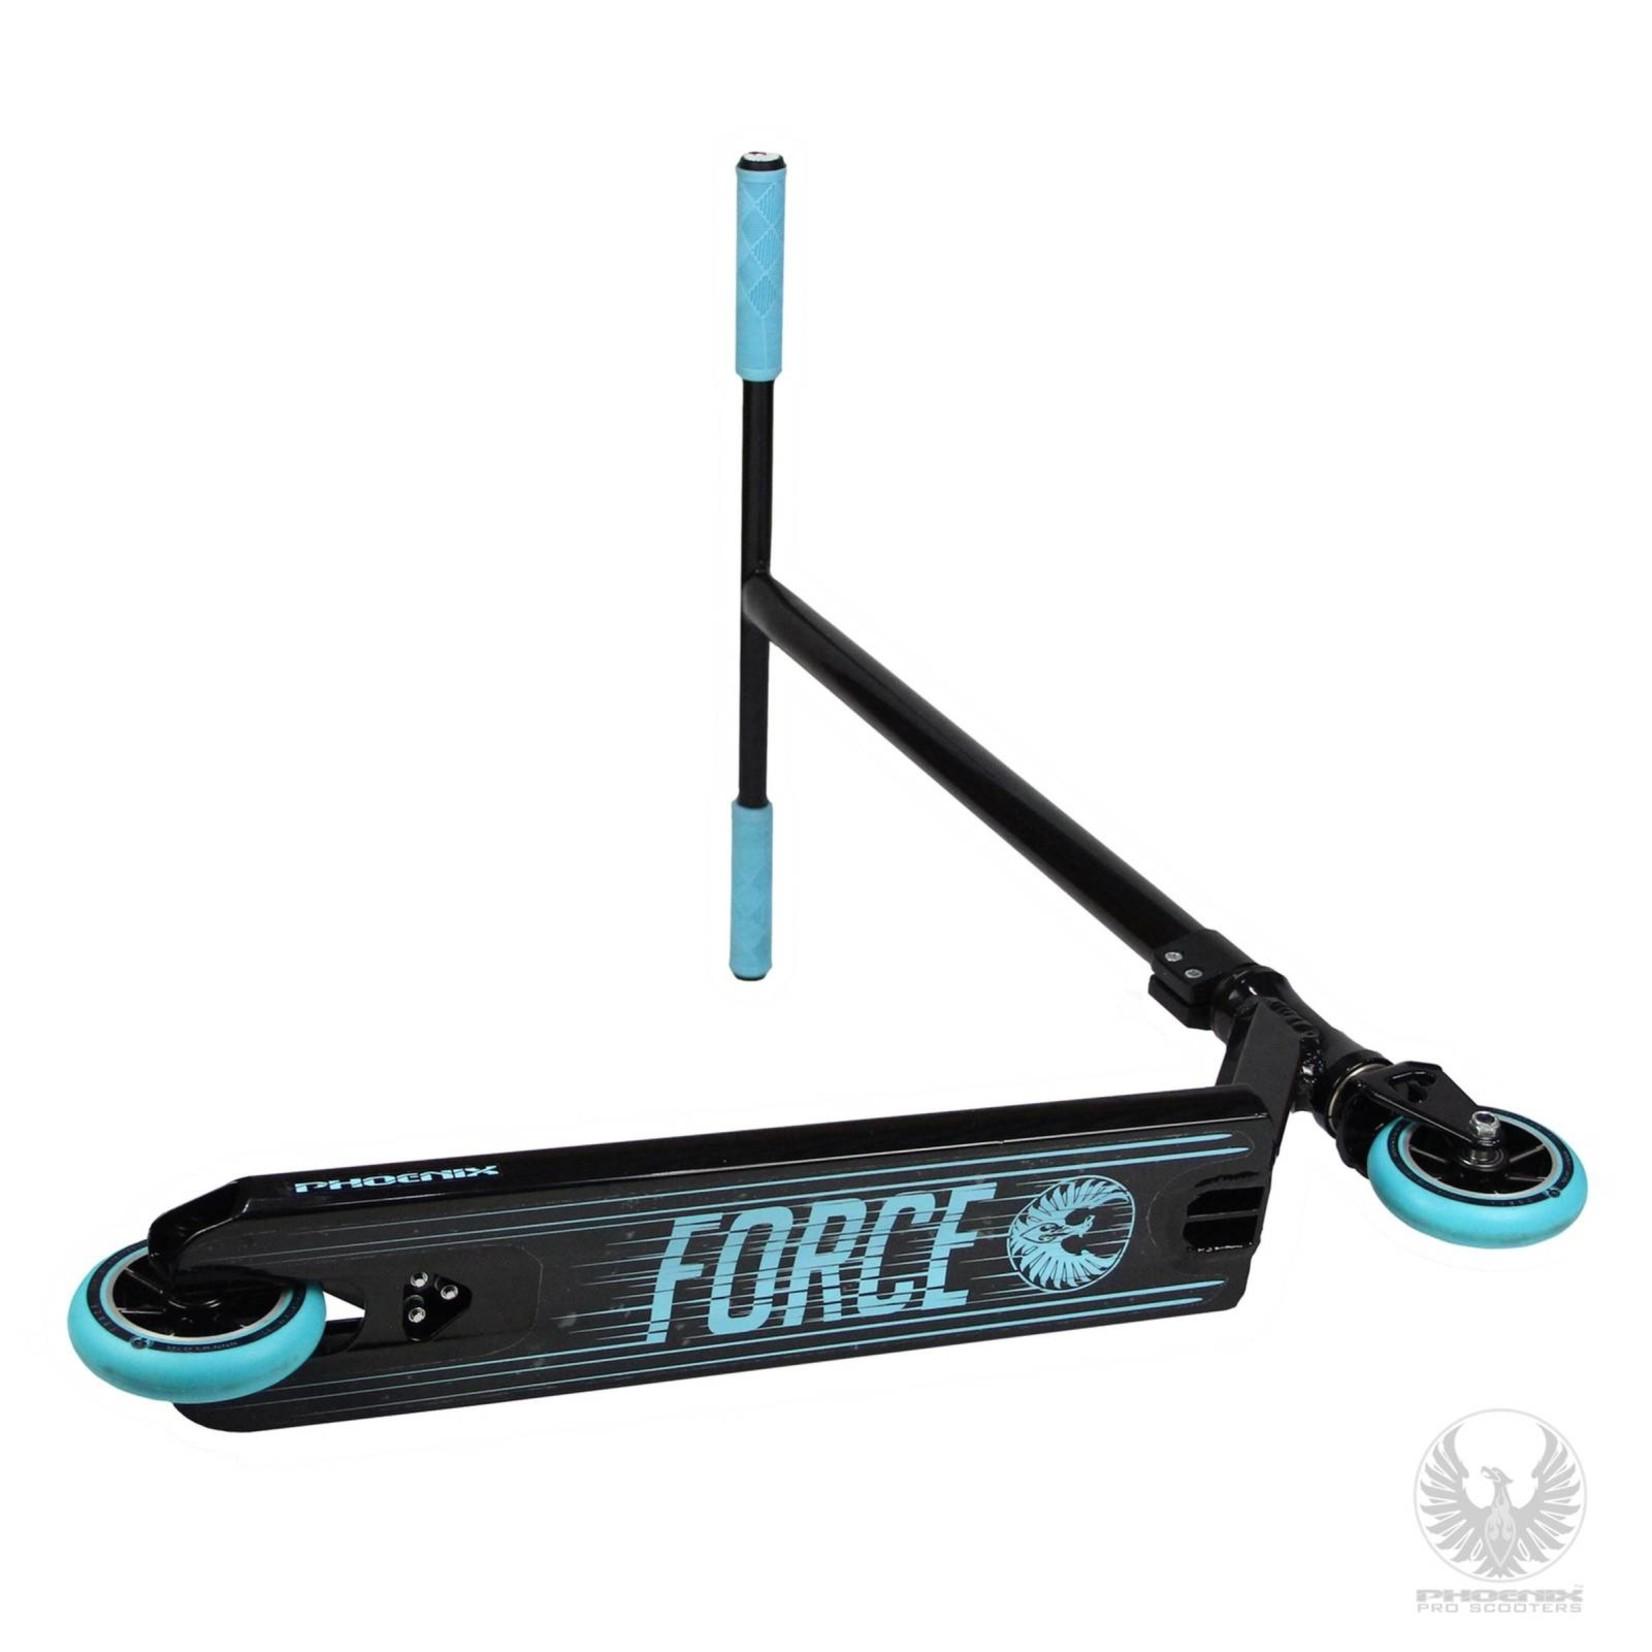 Phoenix Phoenix Force Pro Scooter Black Blue